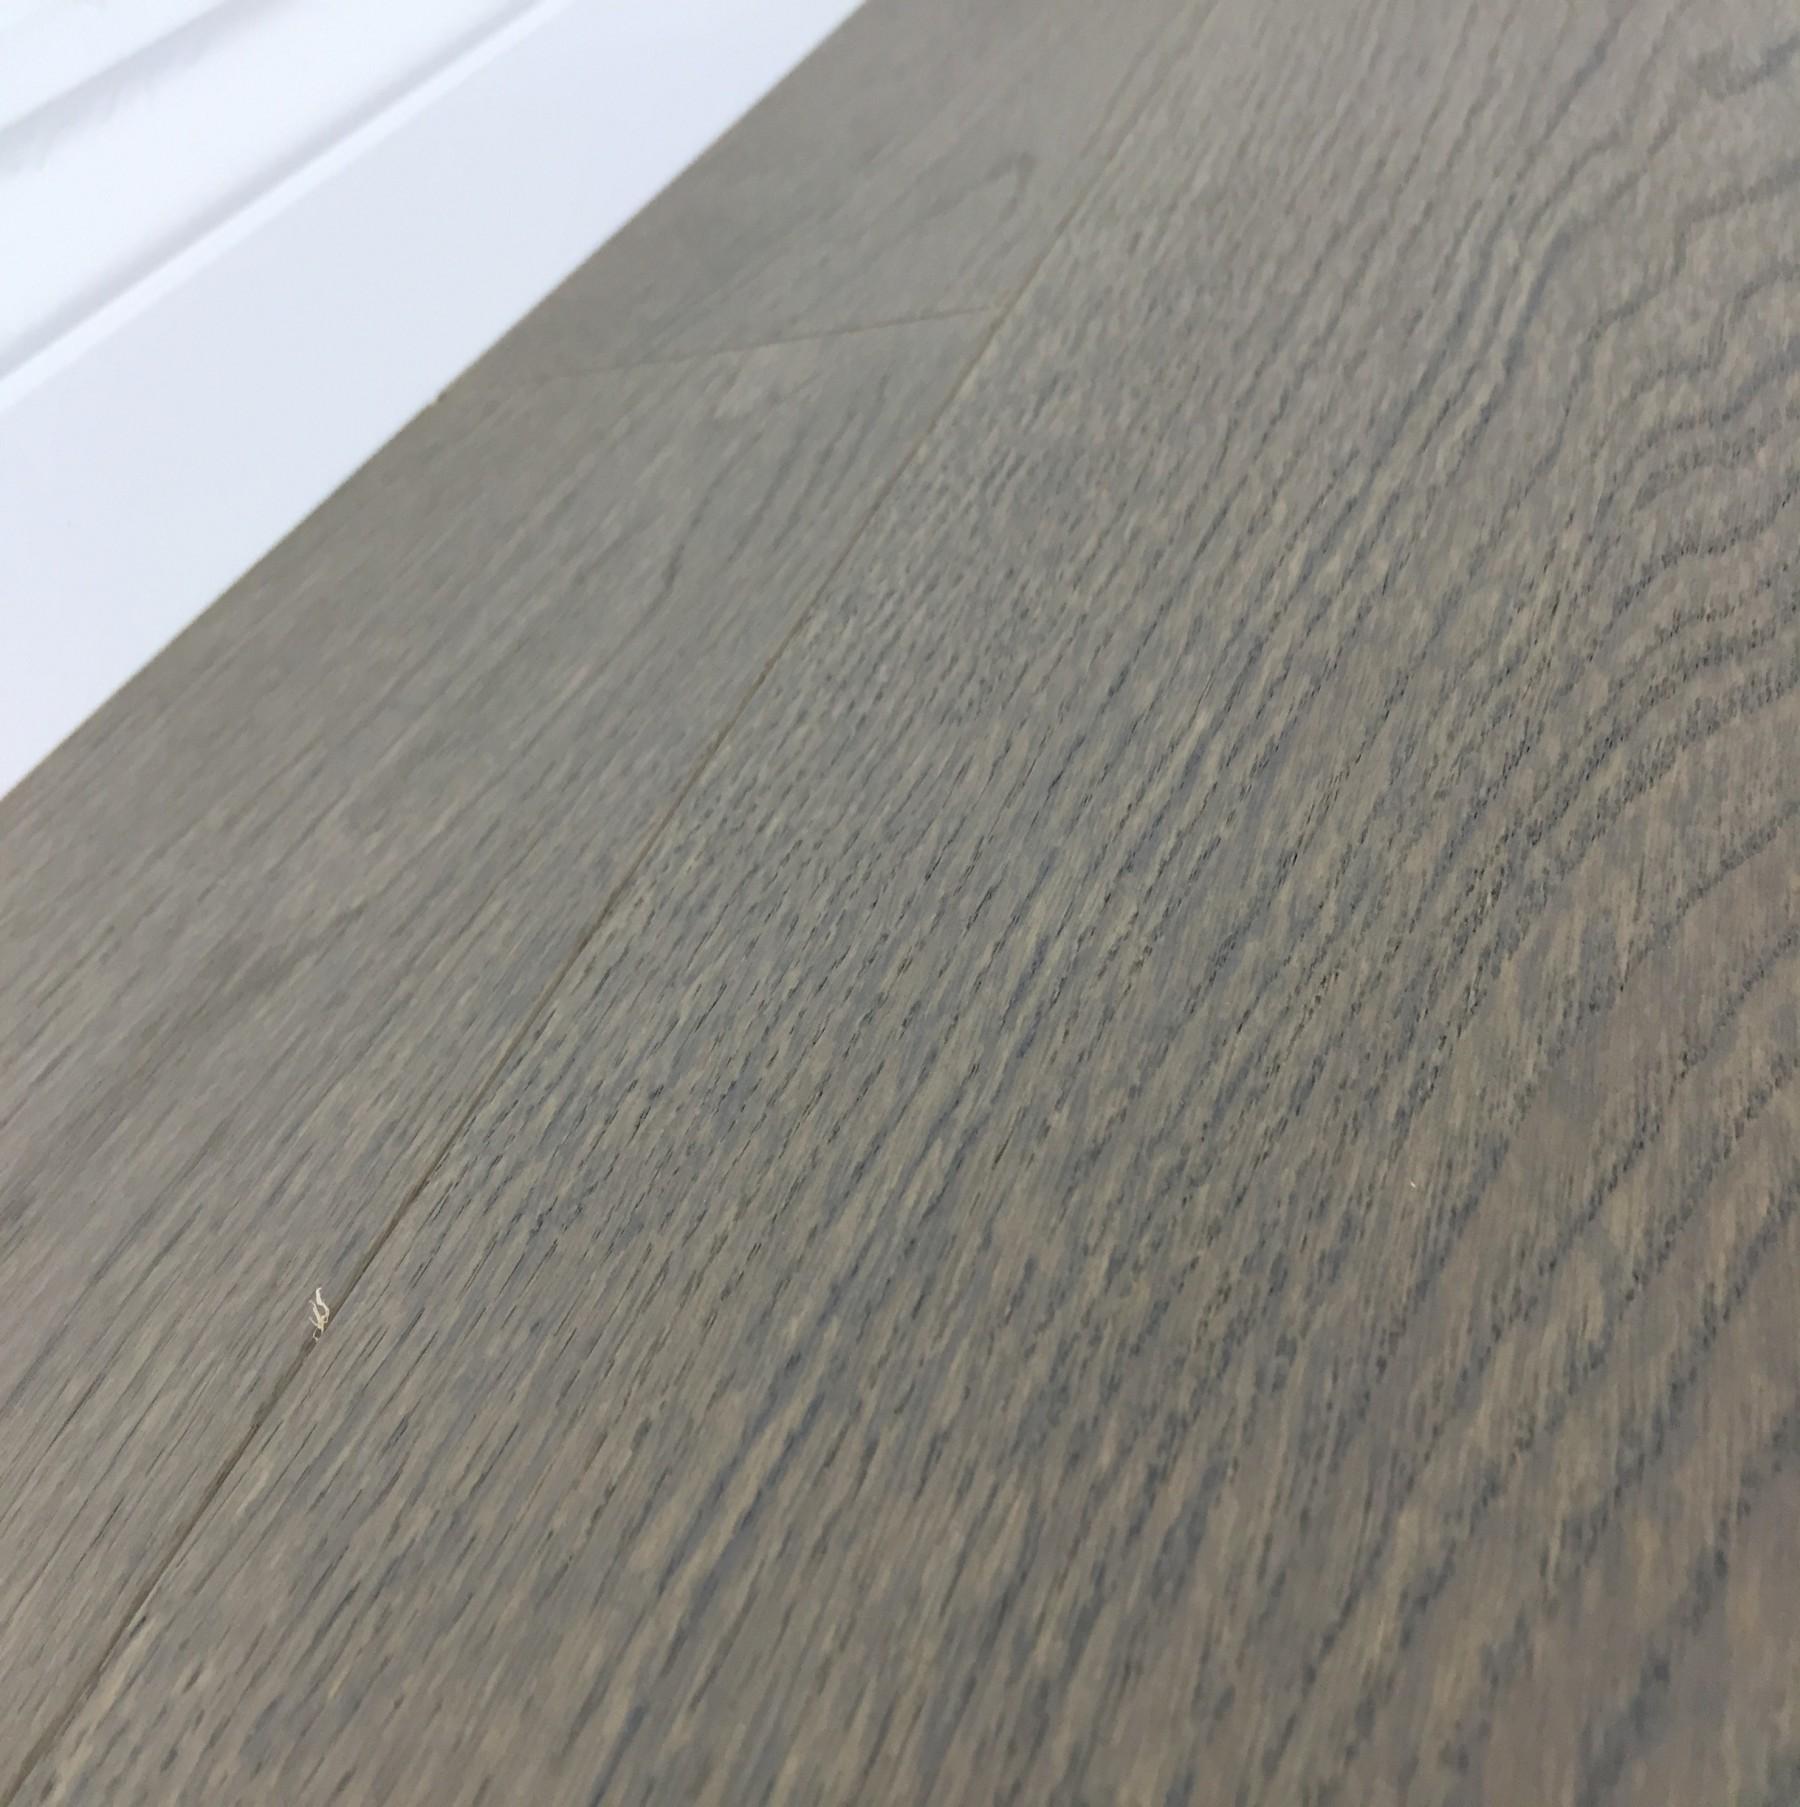 Grisea Oak Flooring Lightly Brushed Matt UV Lacquered, Bronze